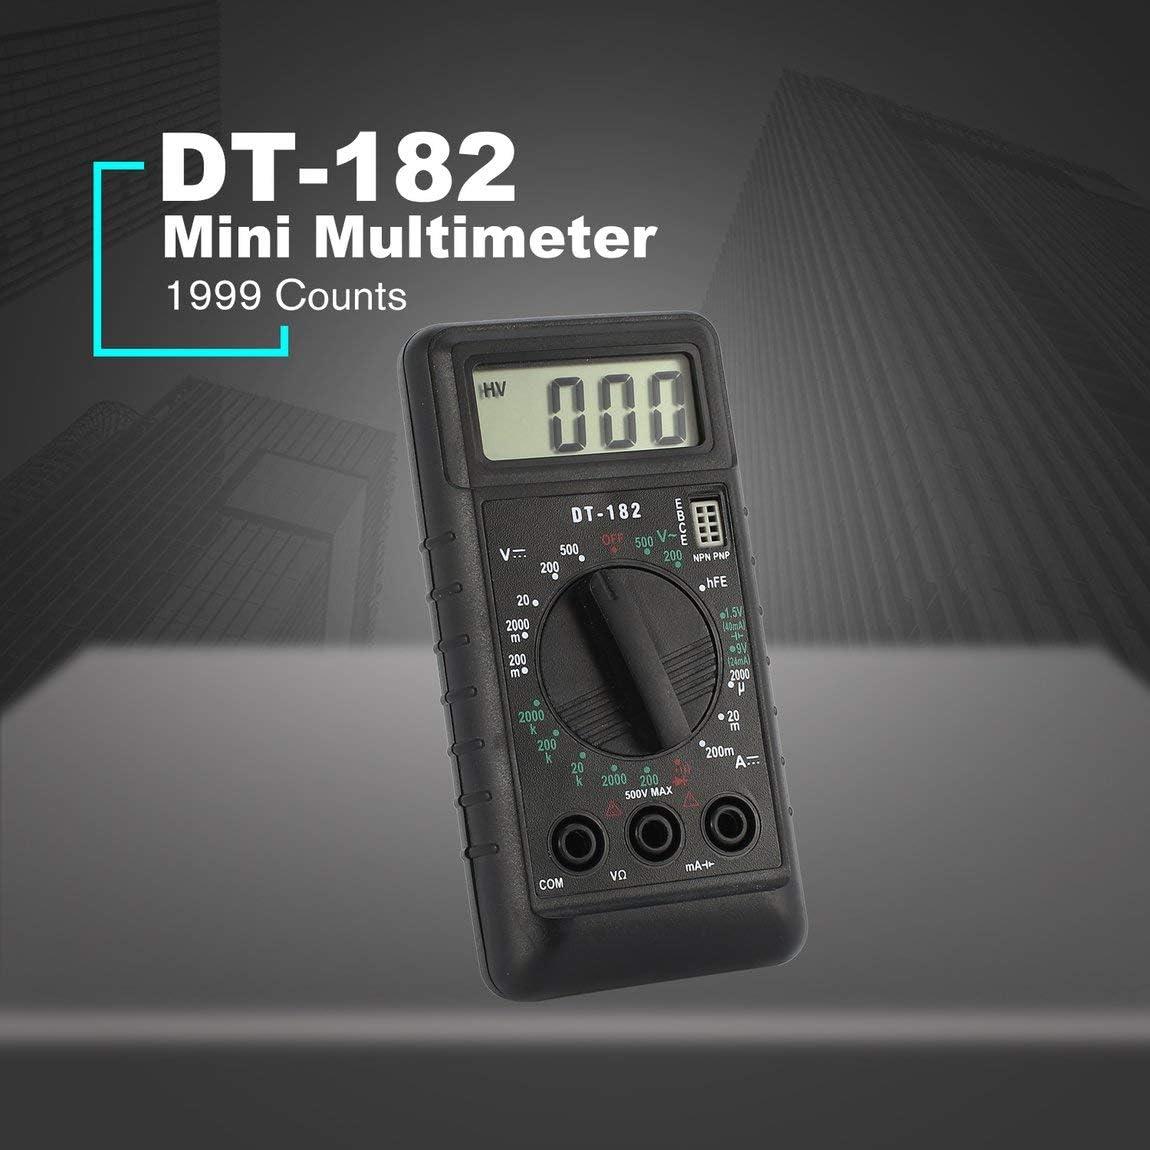 SeniorMar DT-182 Mini mult/ímetro Digital Voltaje DC//AC Medidor de Corriente Volt/ímetro de Bolsillo de Mano Amper/ímetro Diodo Triode Tester Multitester